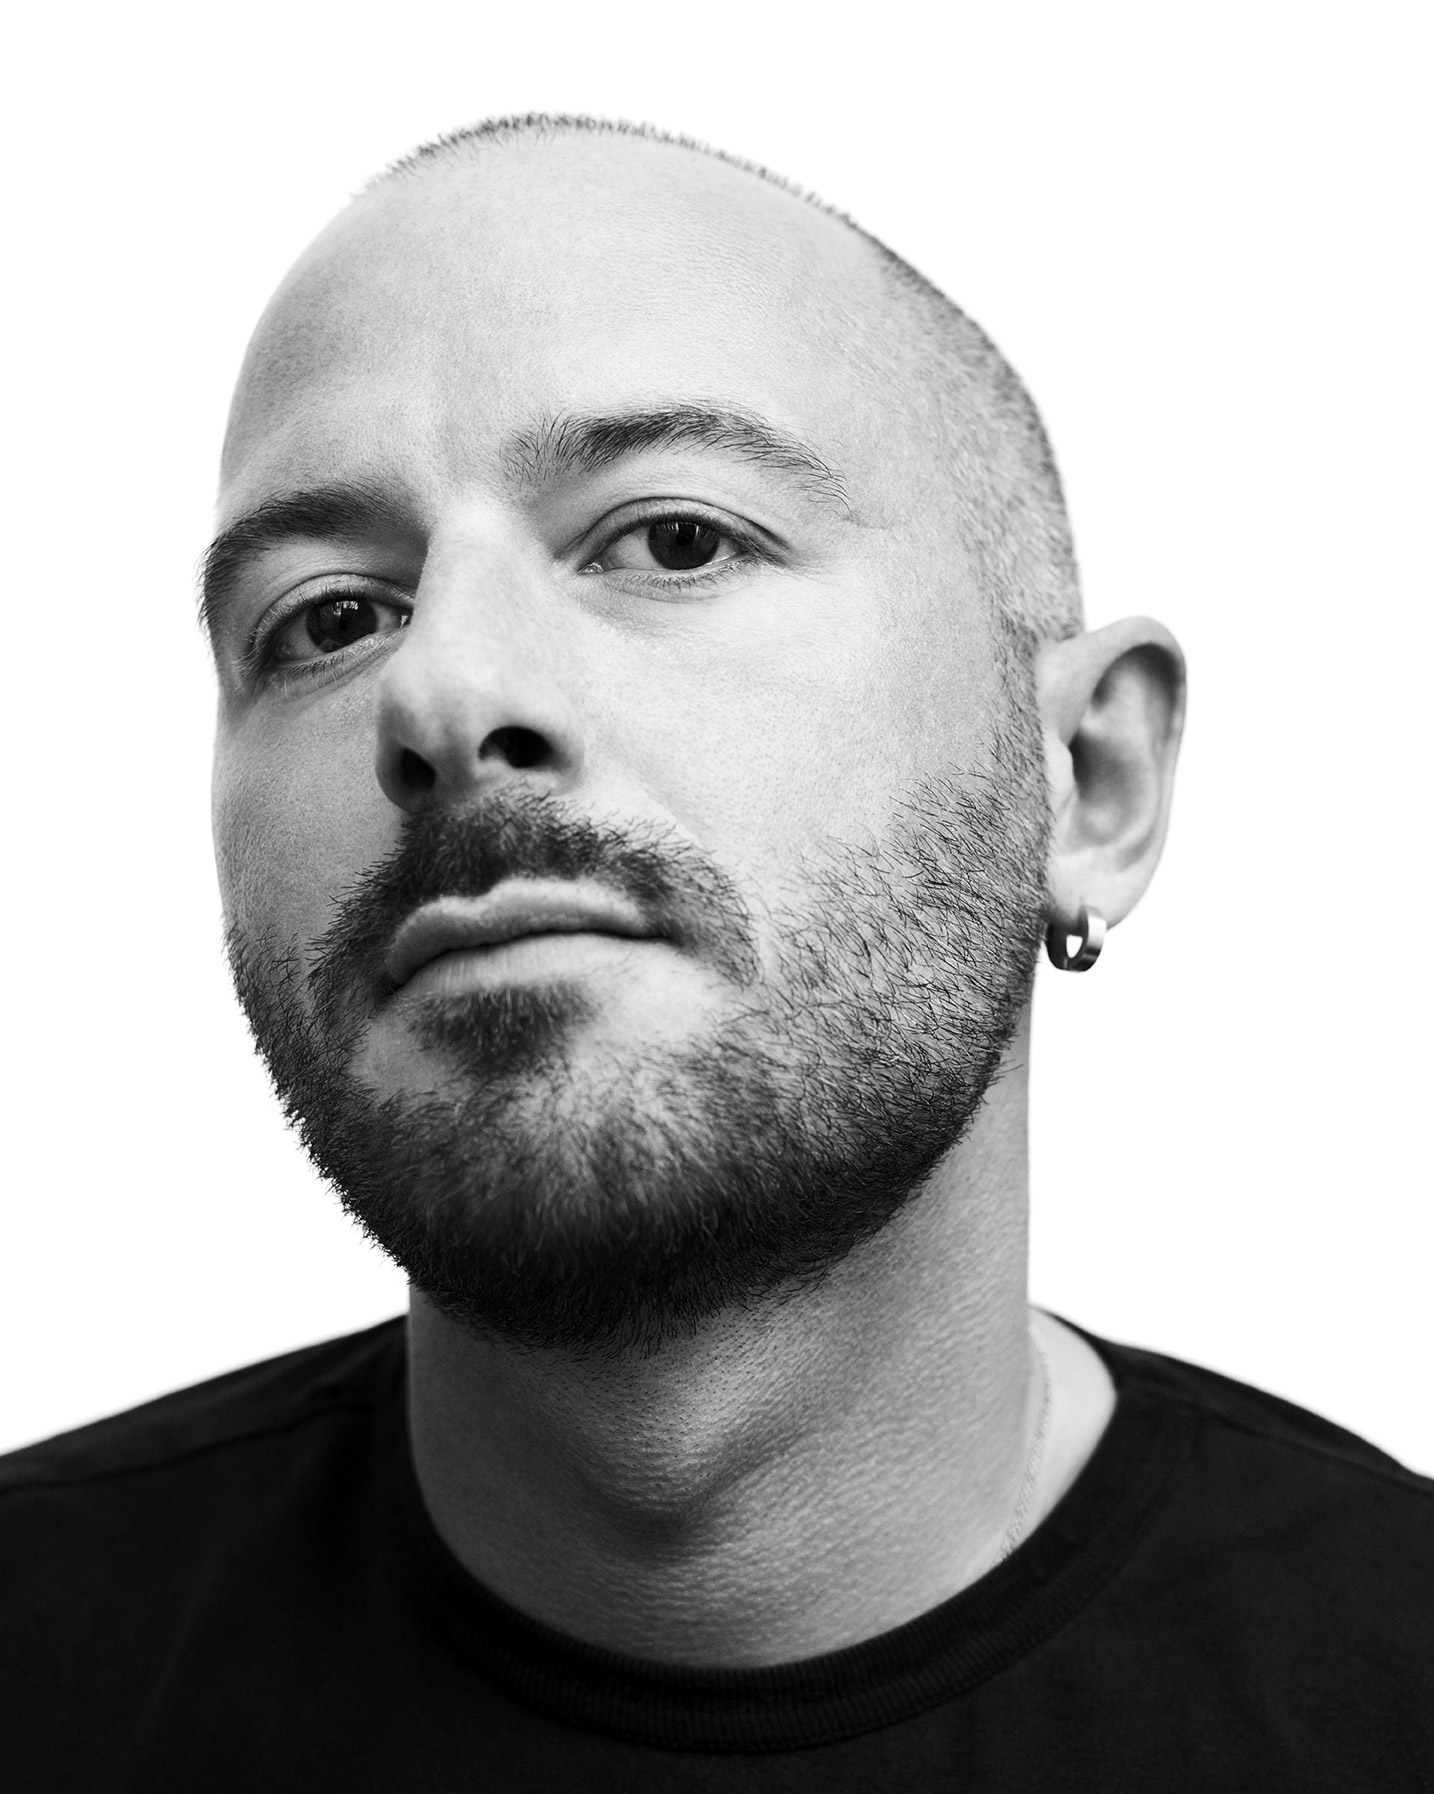 34 year old Balenciaga artistic director Demna Gvasalia.